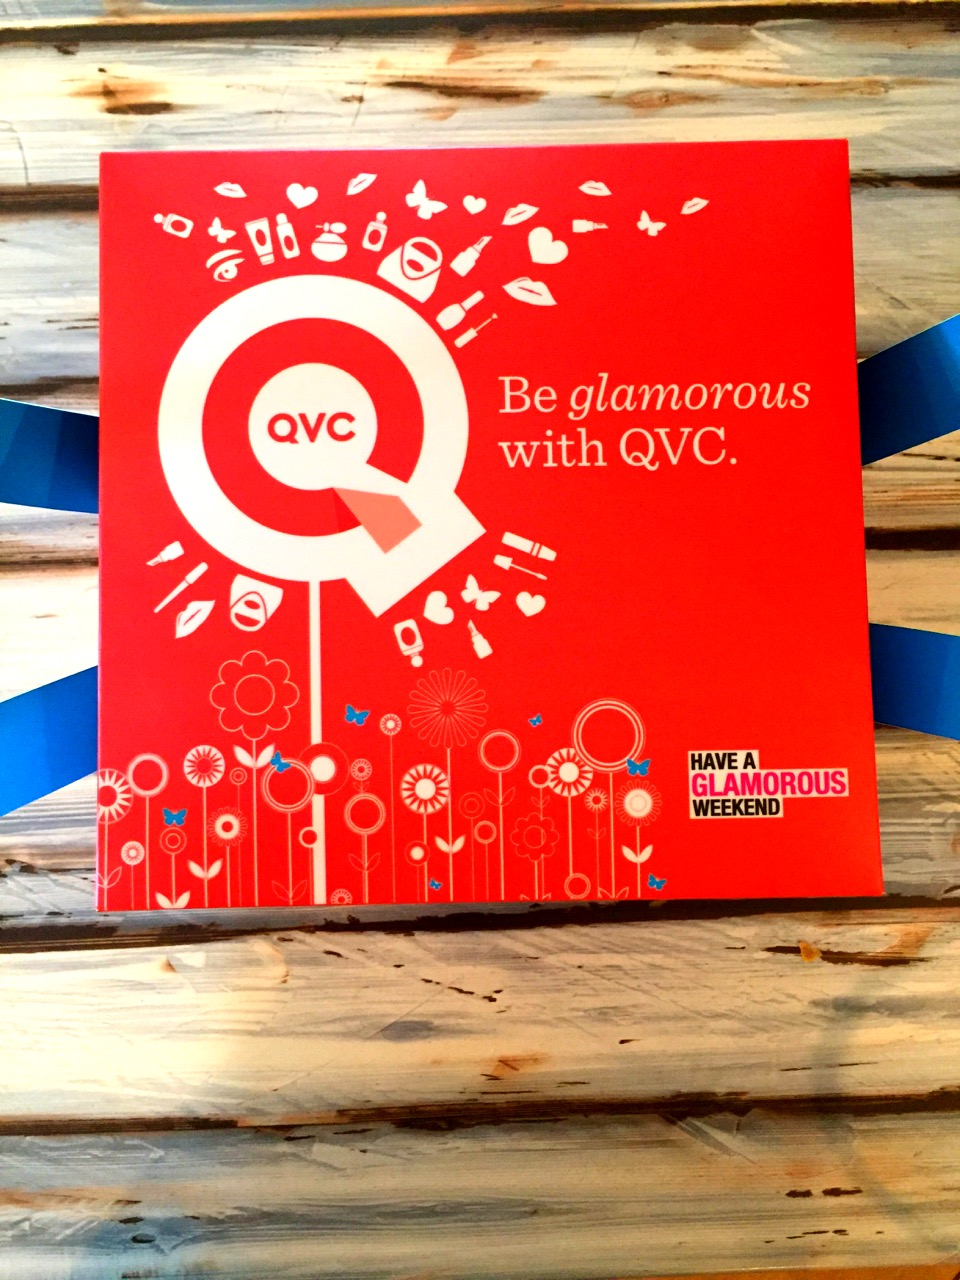 qvc glamour (4)